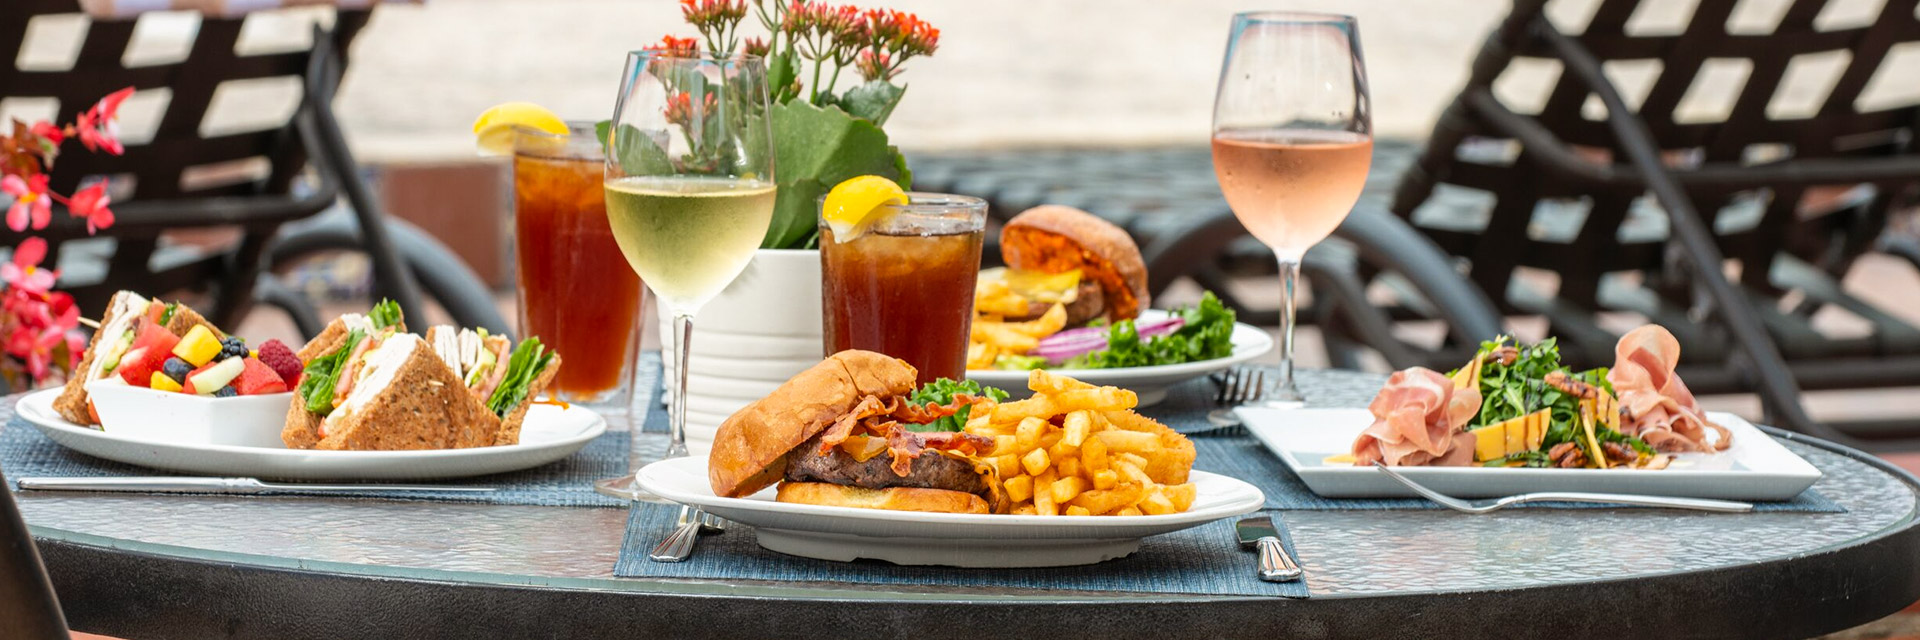 Lunch & Dinner Menu at La Jolla Beach & Tennis Club